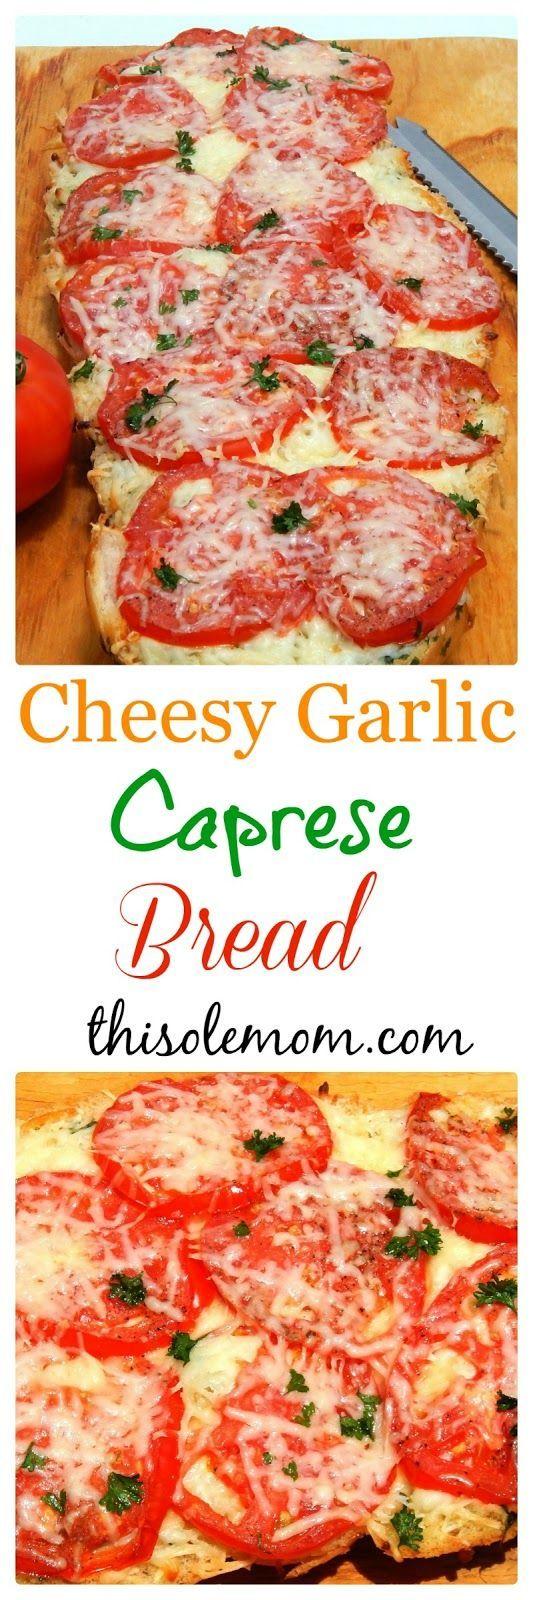 CHEESY GARLIC CAPRESE BREAD